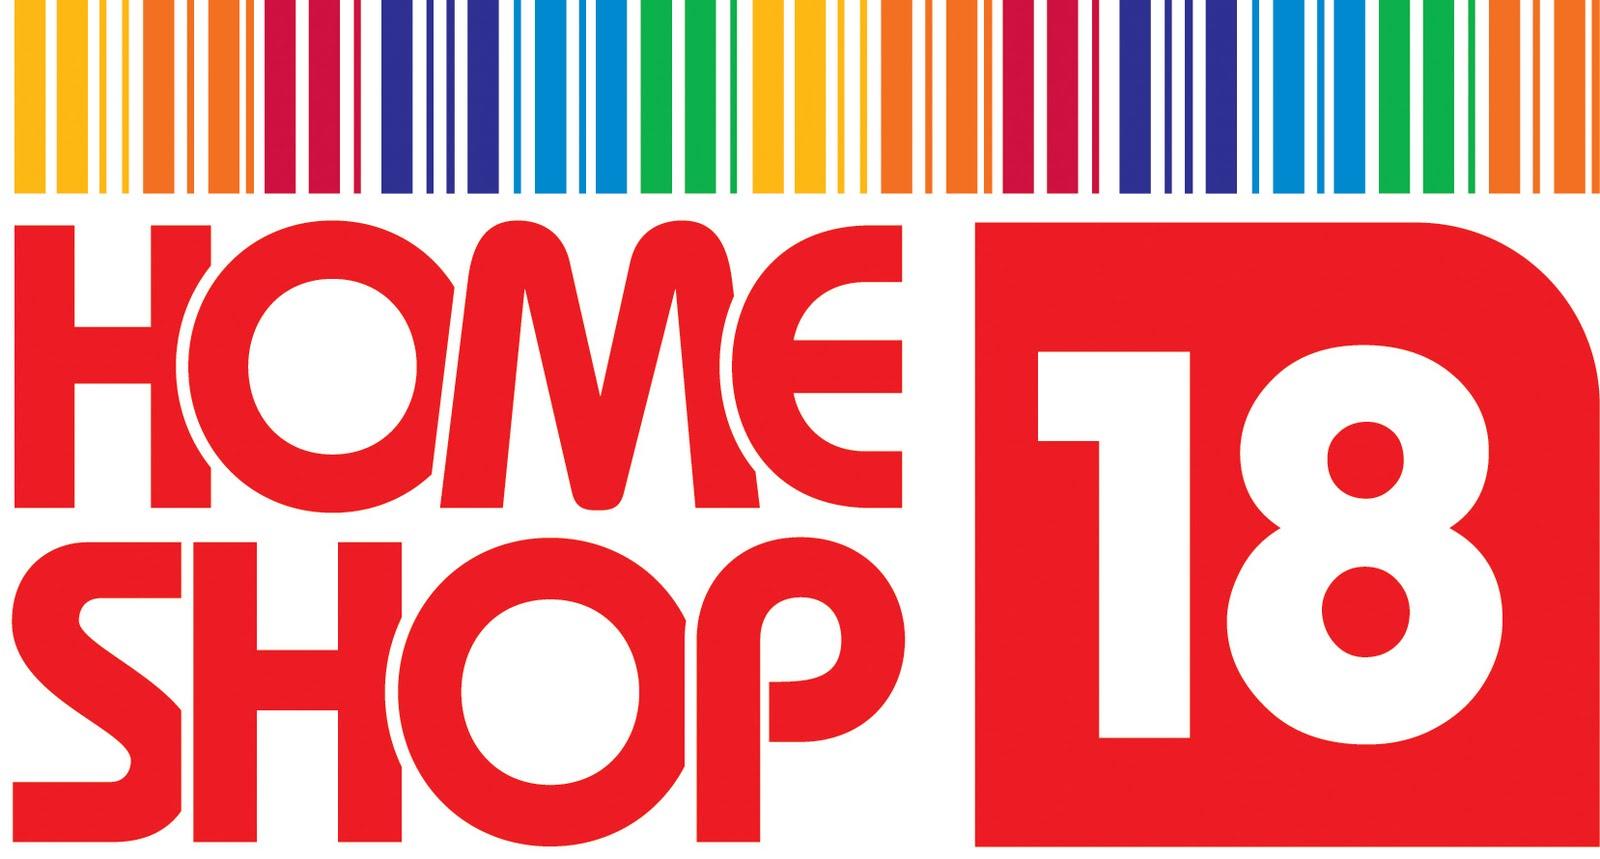 http://2.bp.blogspot.com/-Tquv0XwIXu4/TuQg4vwdDvI/AAAAAAAADqg/Vv_xgk8tefo/s1600/HomeShop18_Logo.jpg